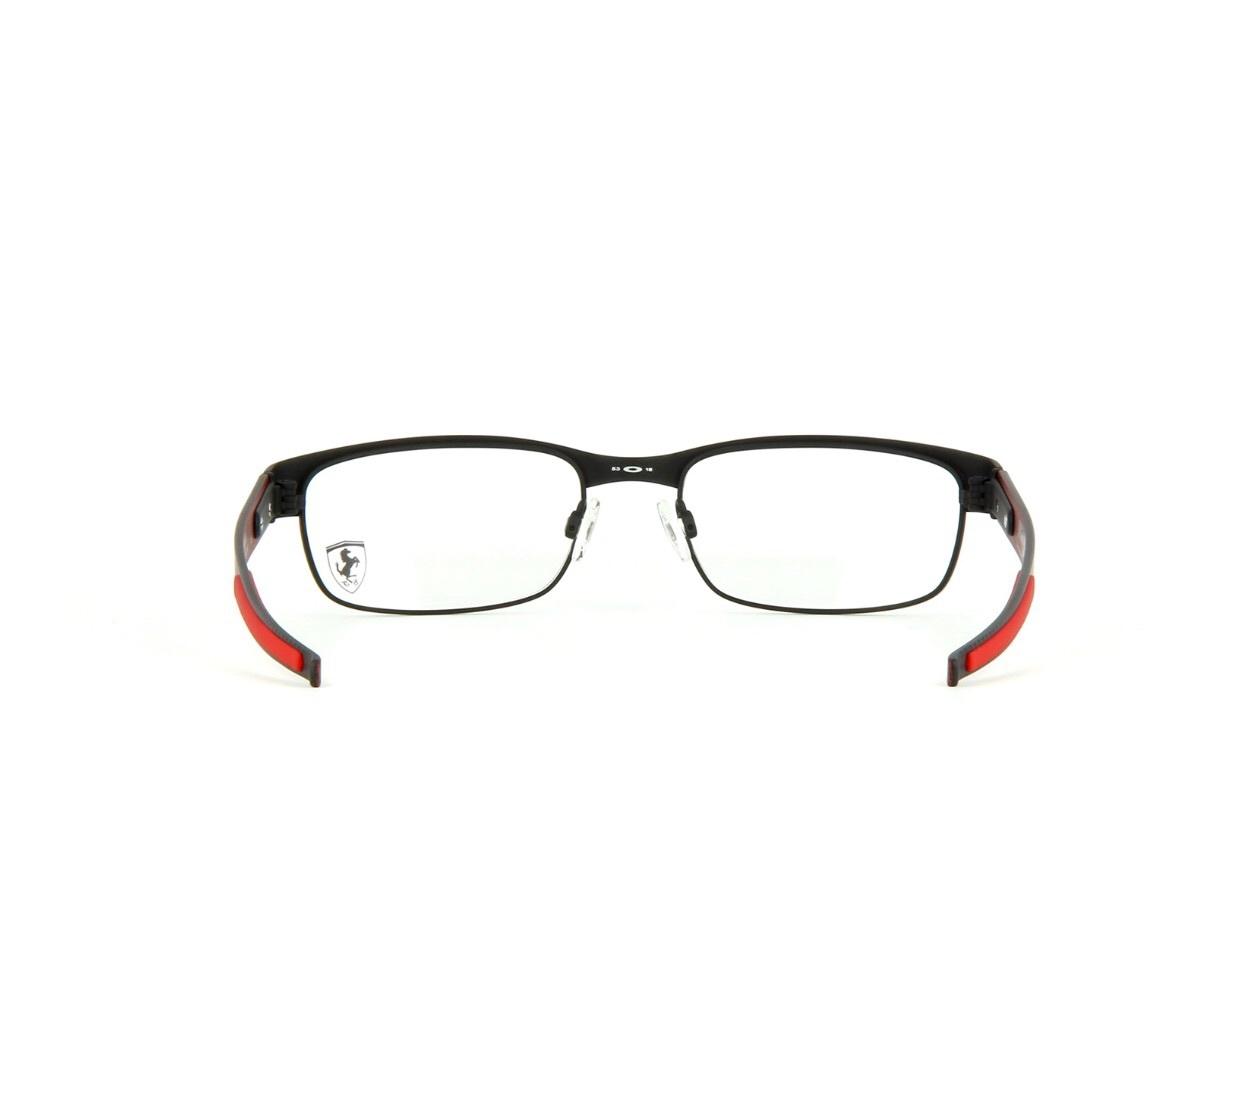 Oakley Carbon Plate Black Ferrari Red   David Simchi-Levi b35bdb0b53